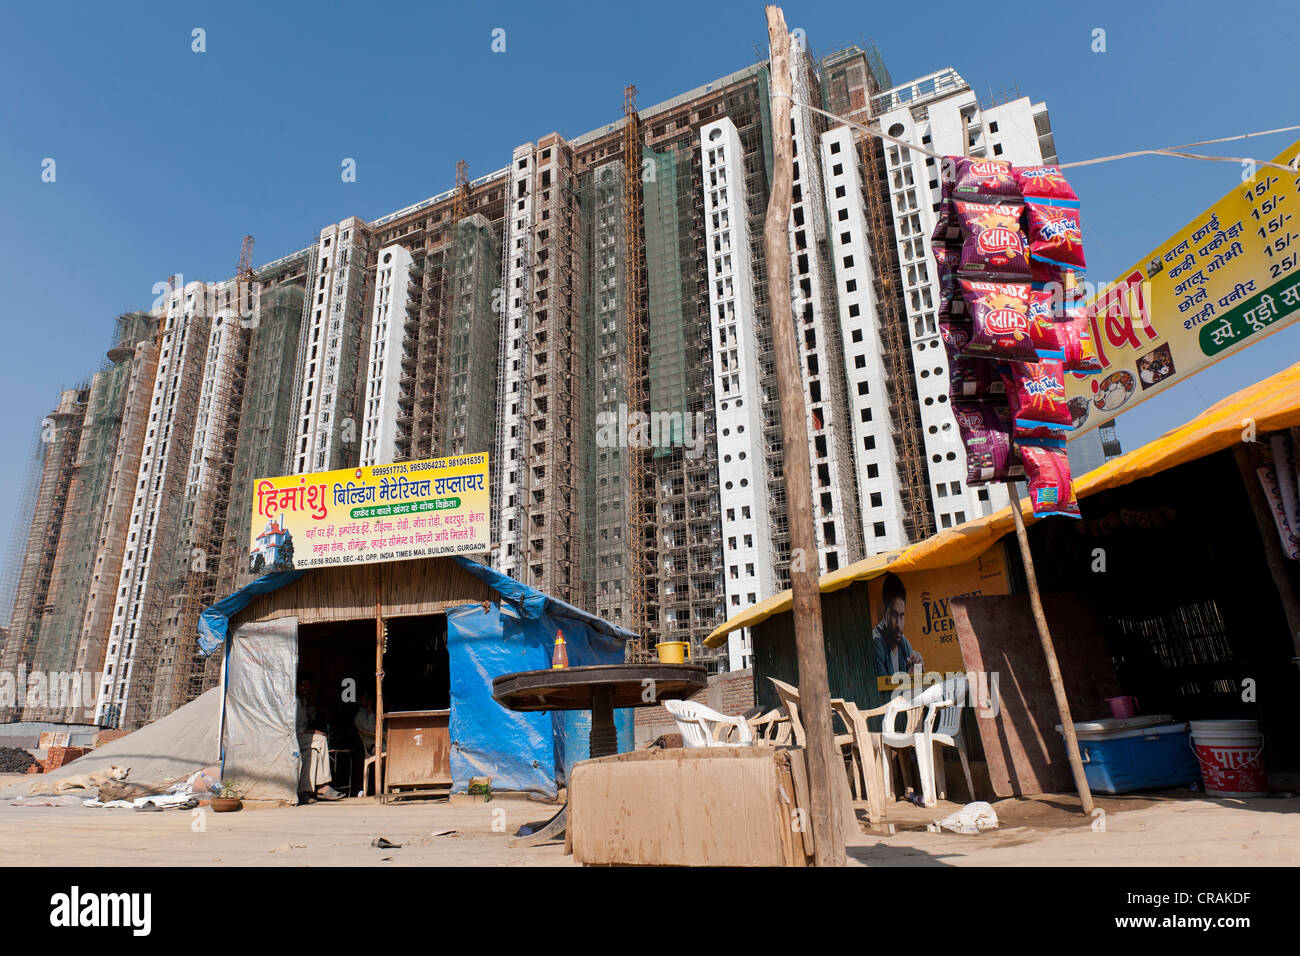 Nuovi edifici residenziali, Gurgaon, Haryana, Nord India, India, Asia Immagini Stock